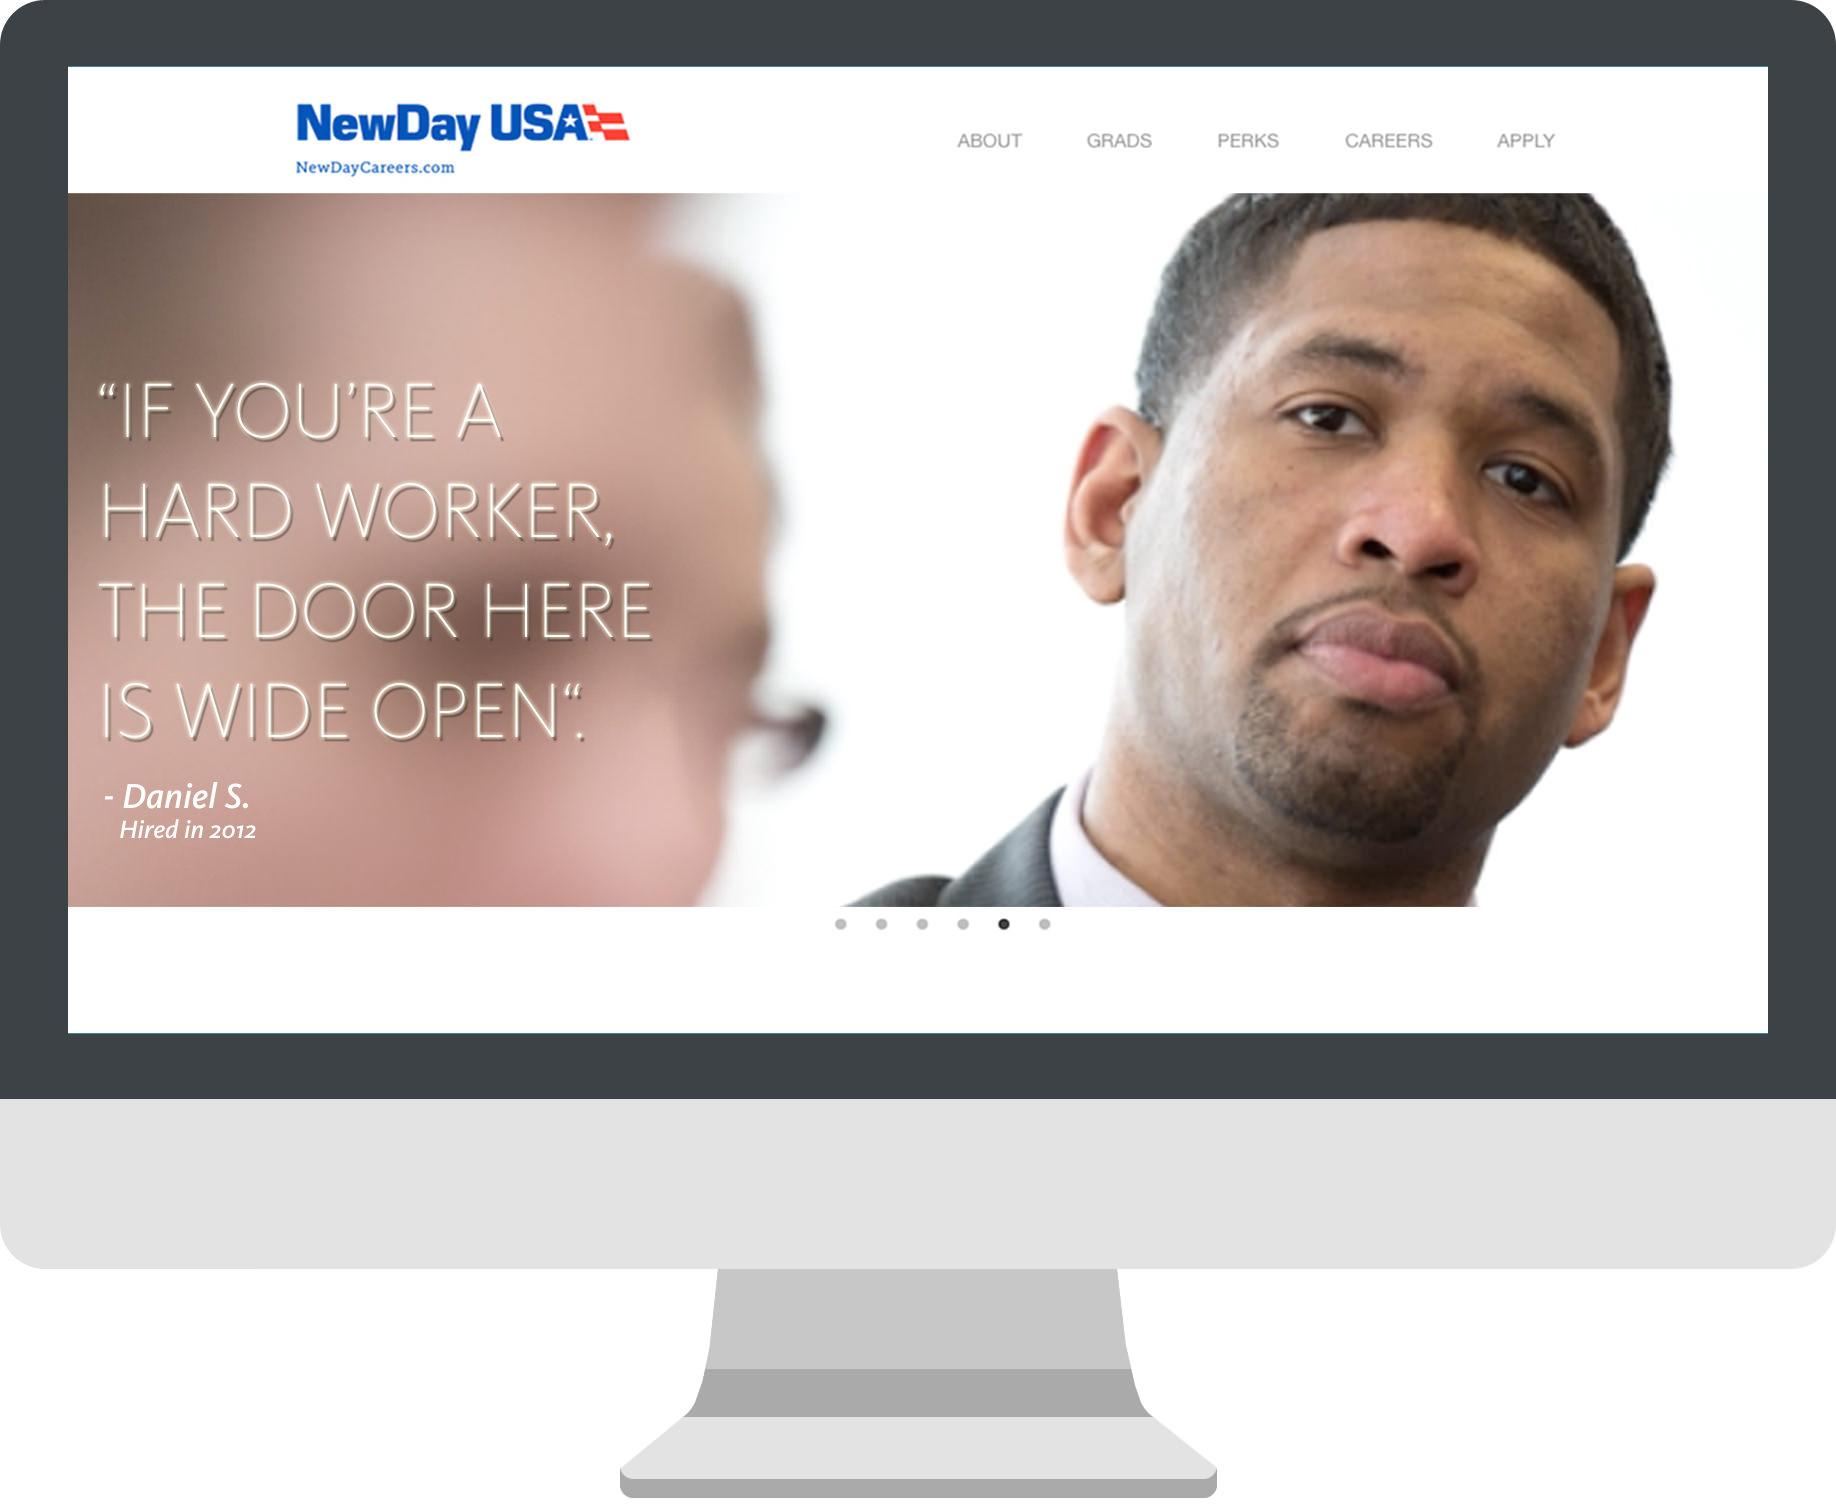 NDC_HARD_WORKER.jpg